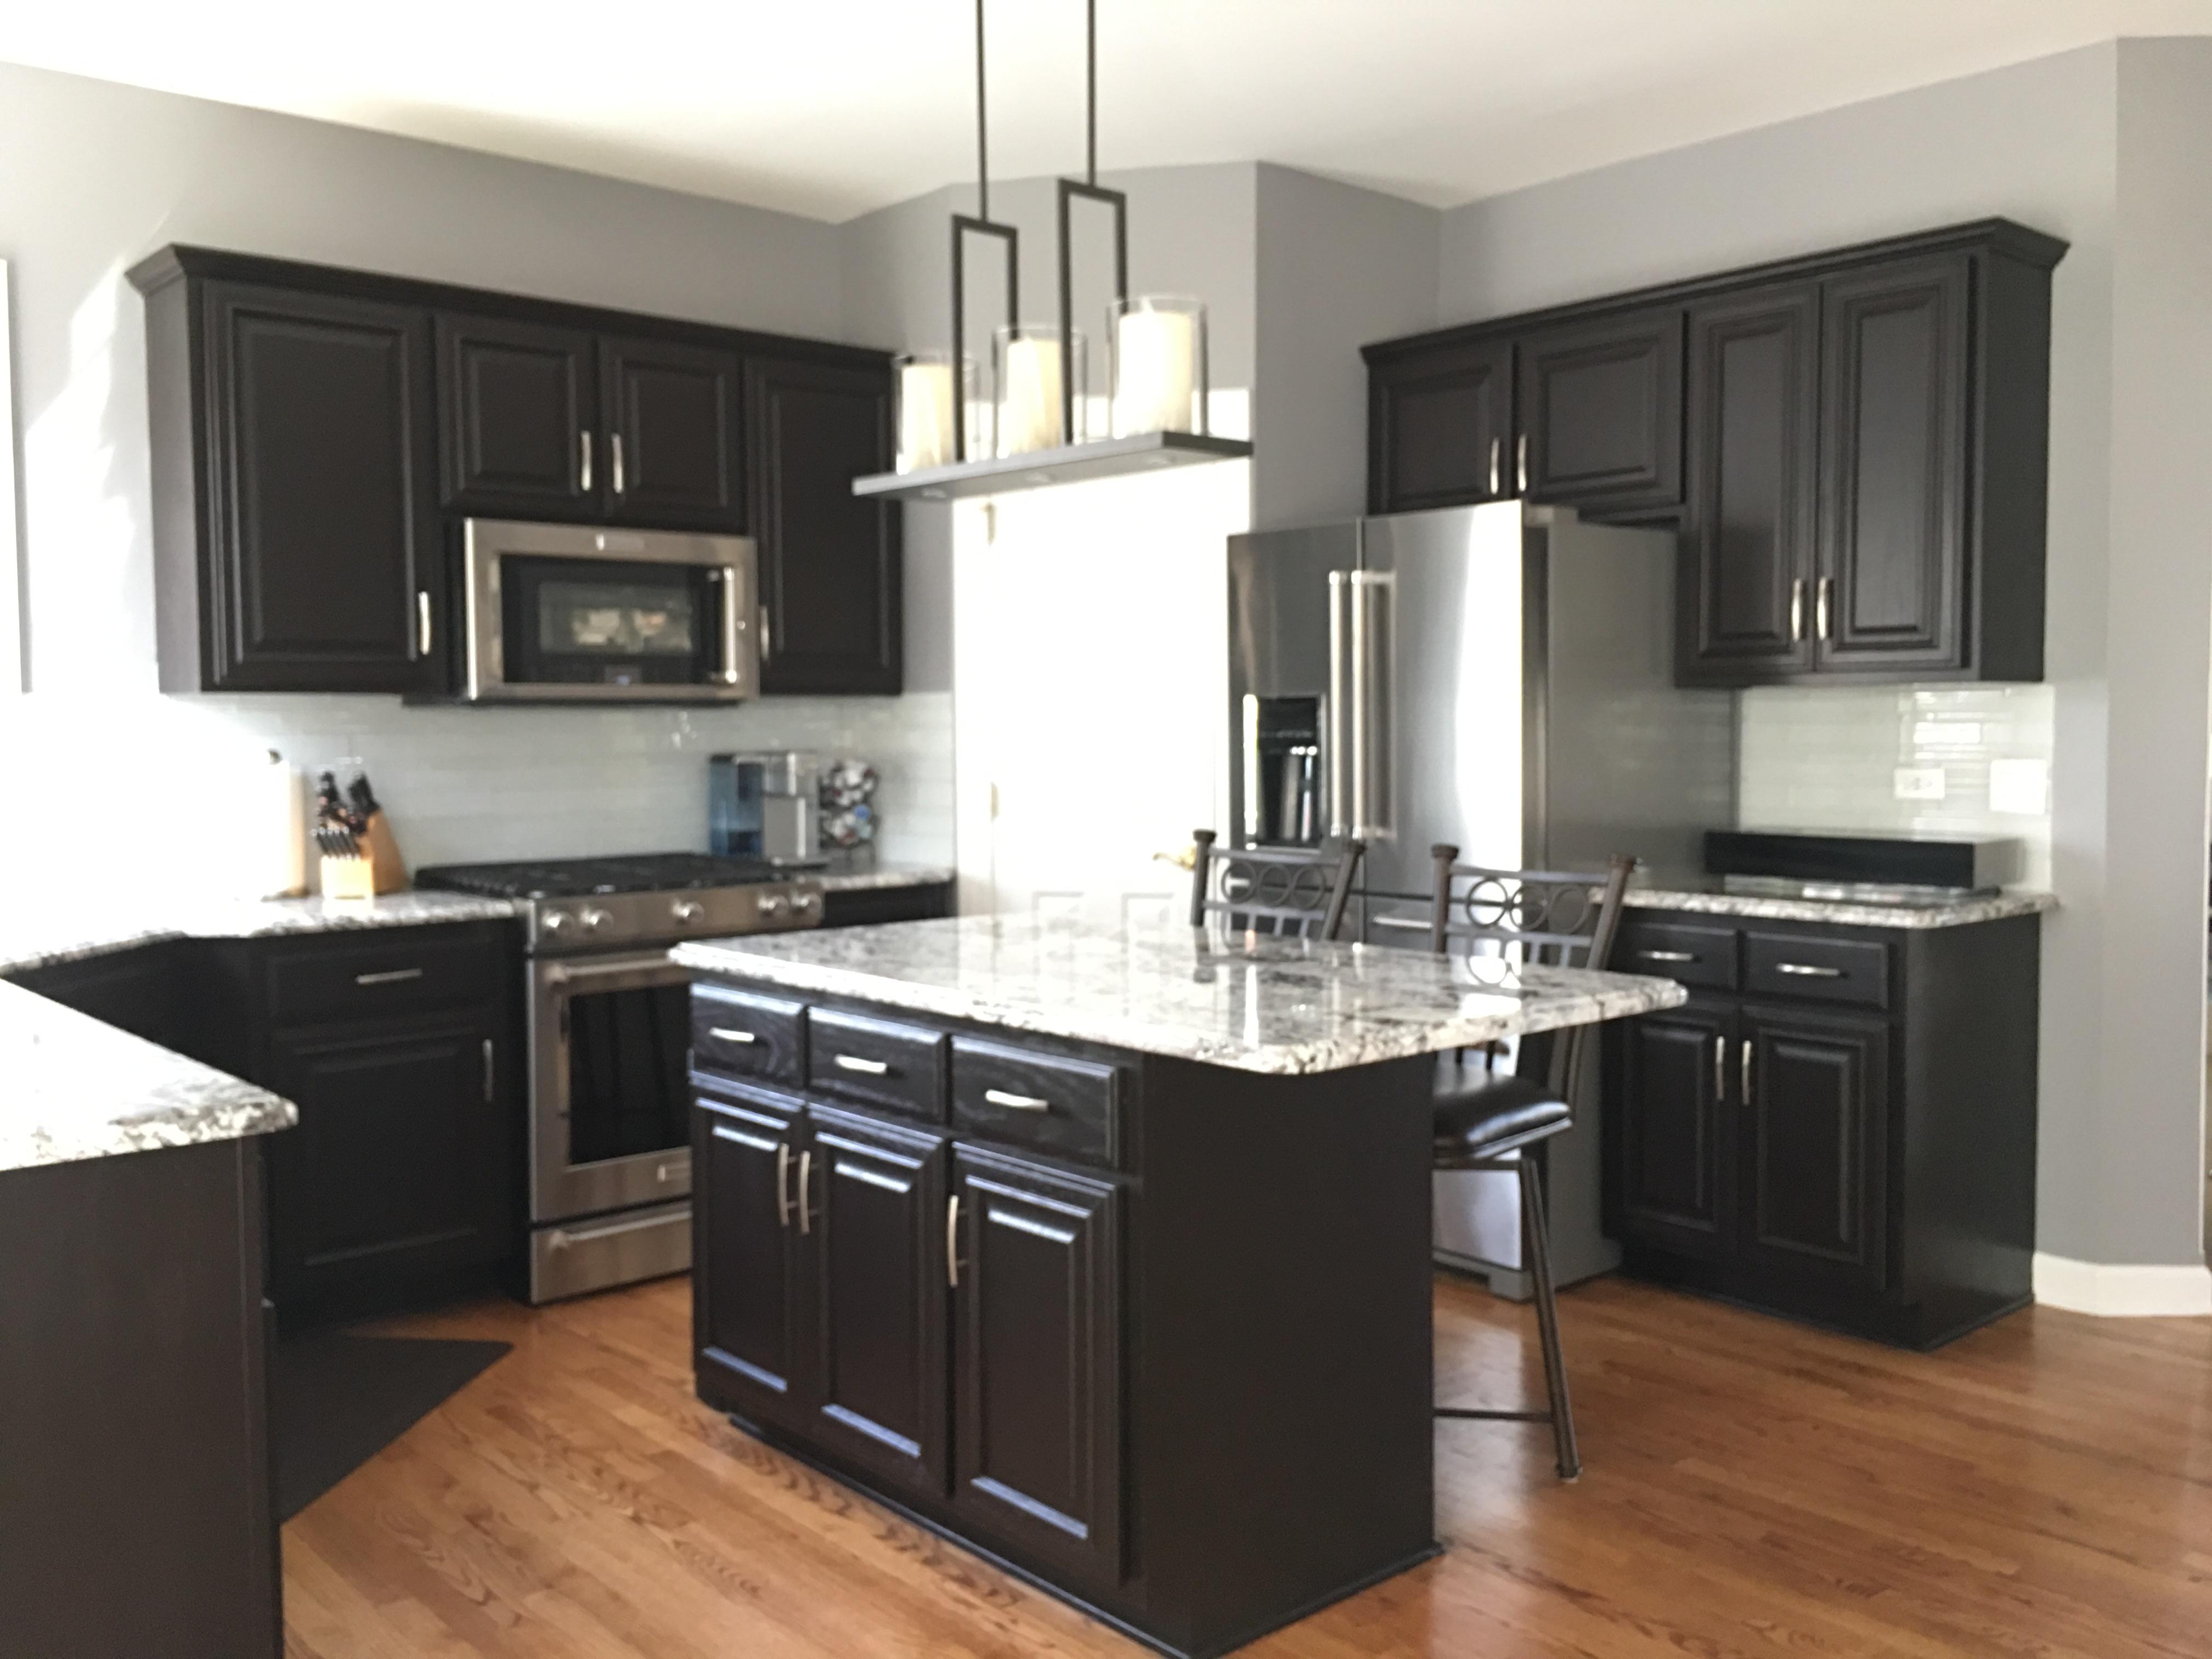 Kitchen Cabinets | General Finishes 2018 Design Challenge